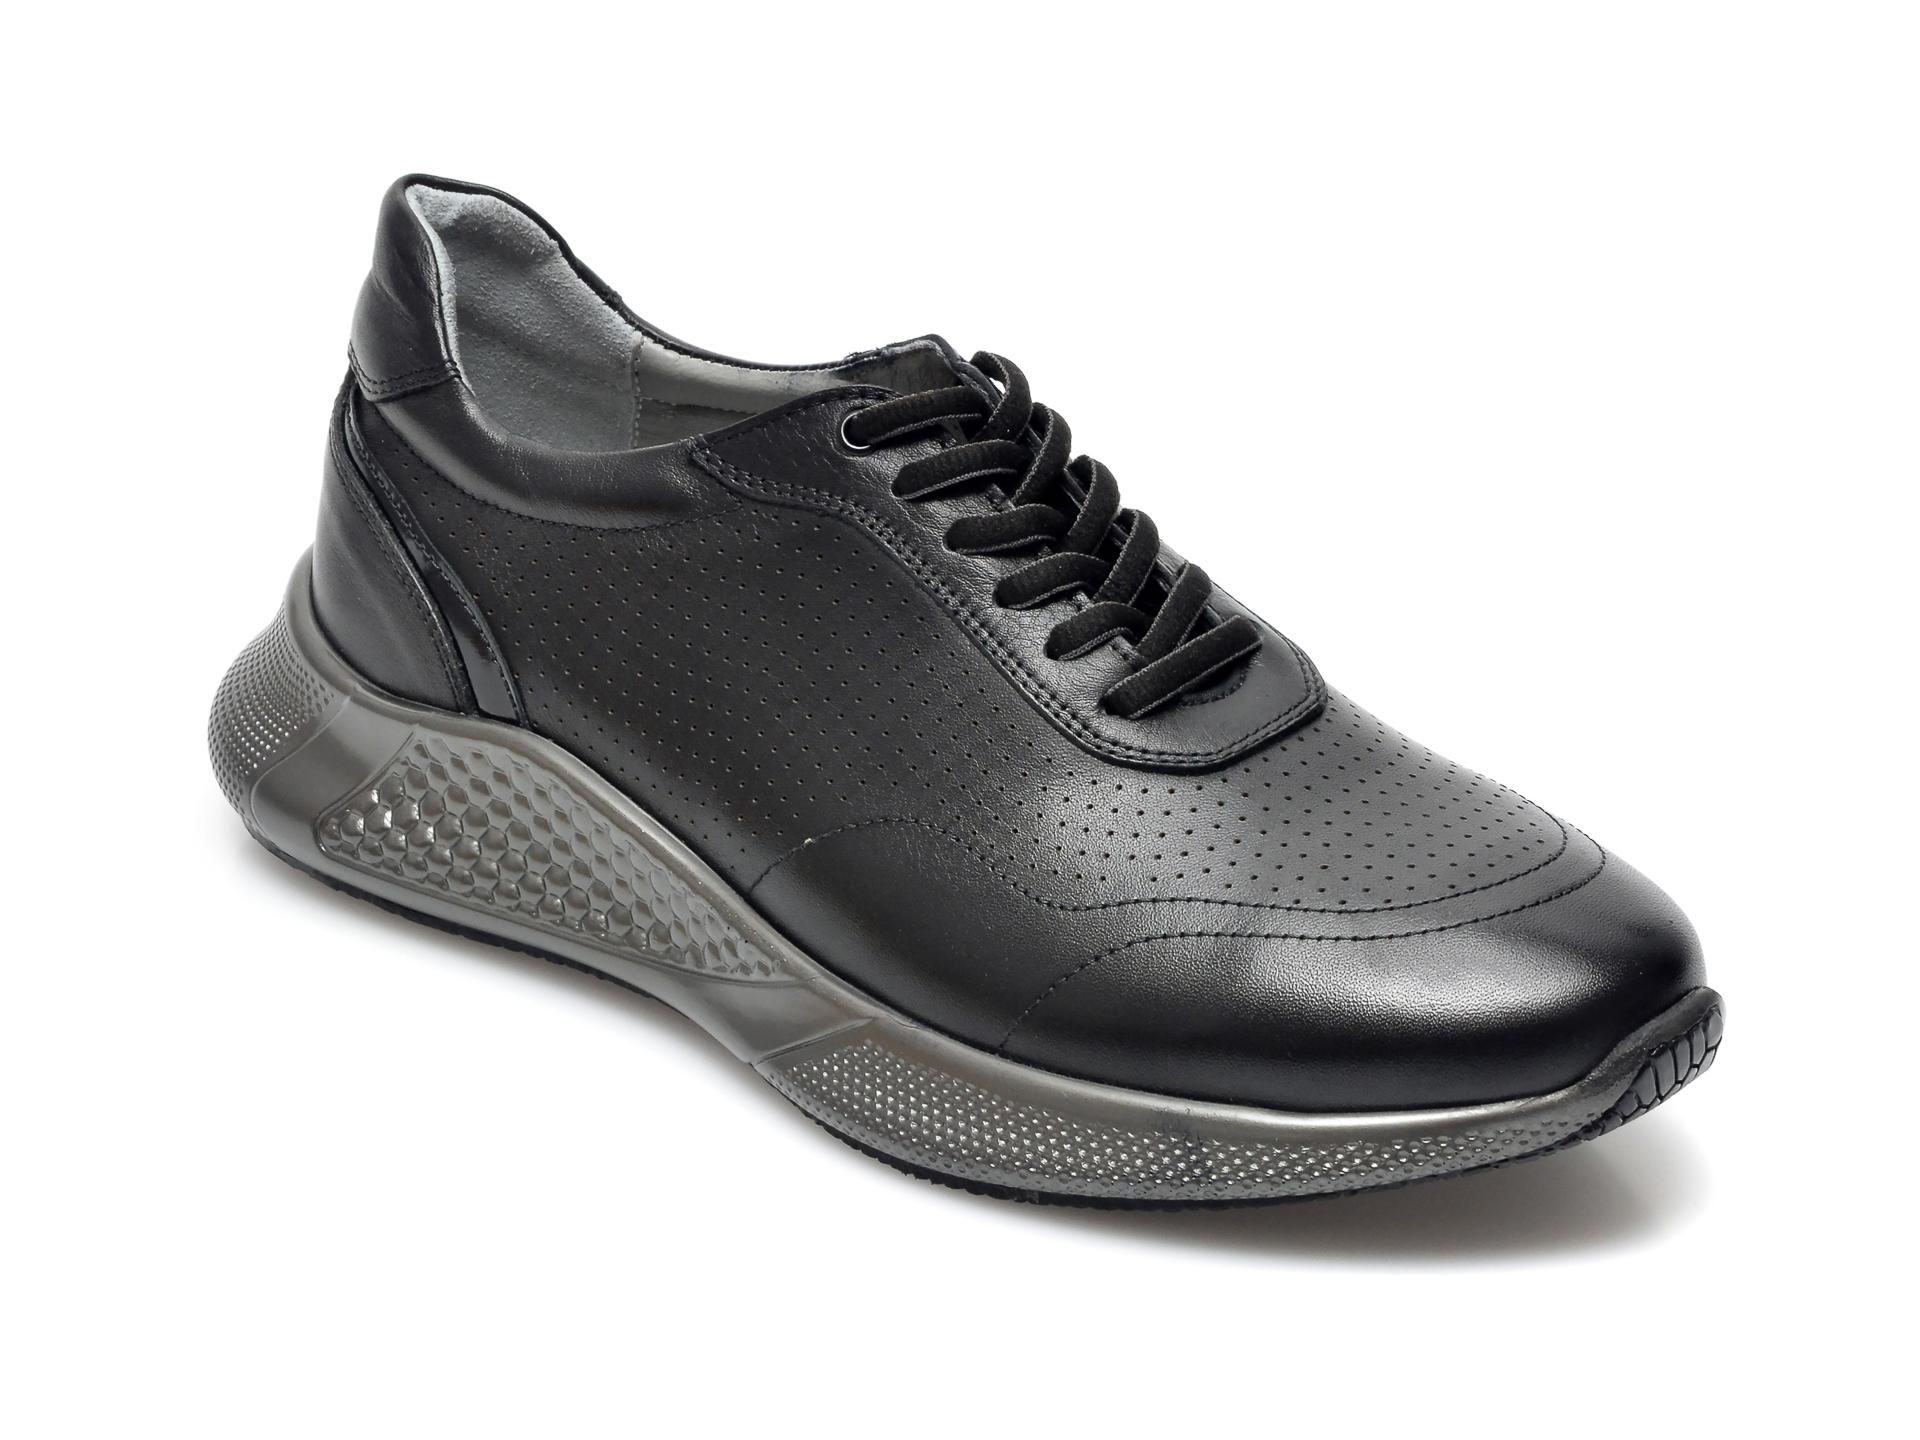 Pantofi Otter Negri, 25403, Din Piele Naturala